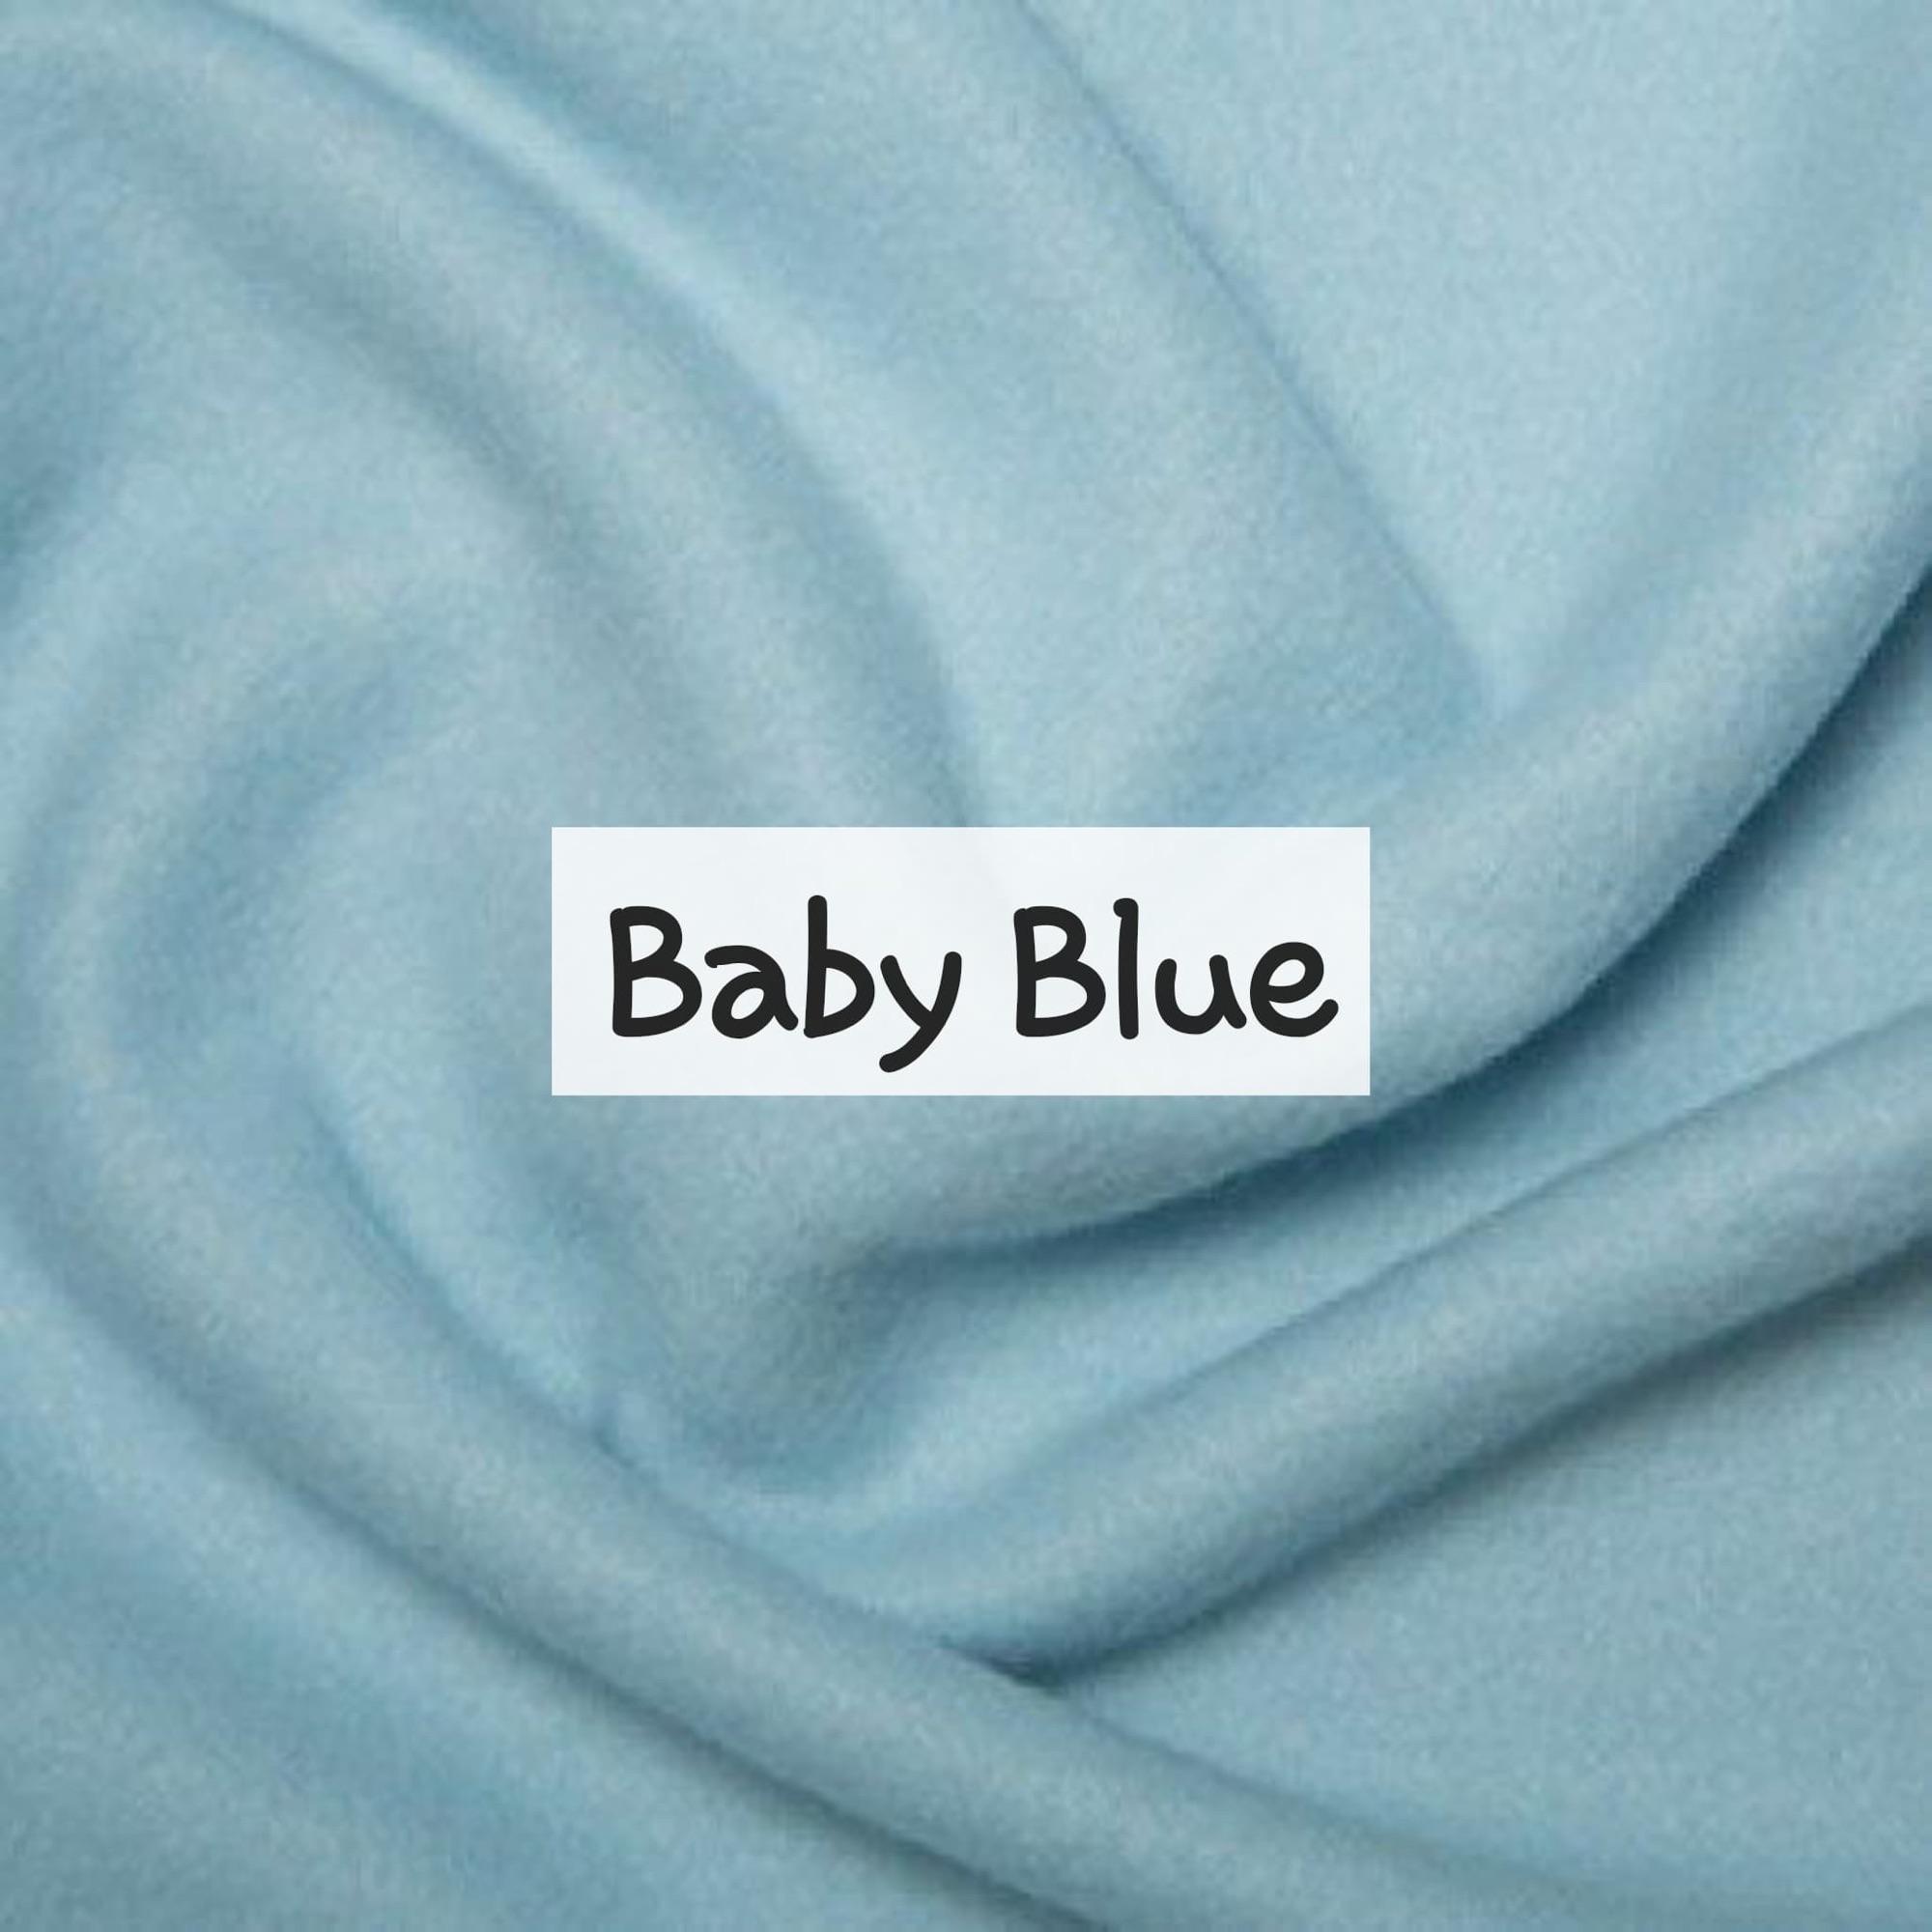 Baby Blue Fleece